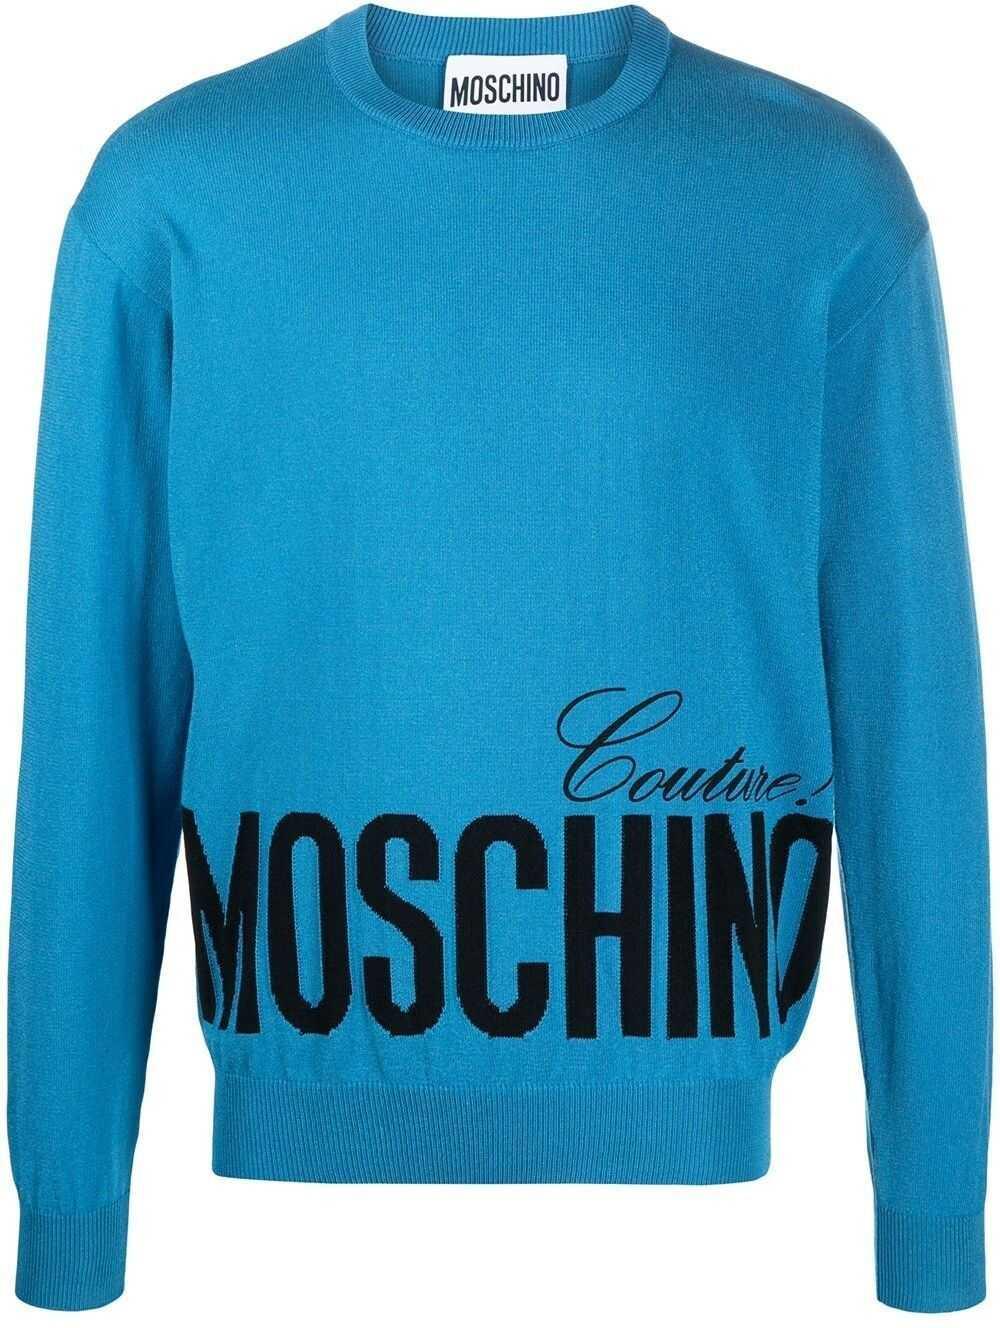 Moschino Cotton Sweater BLUE